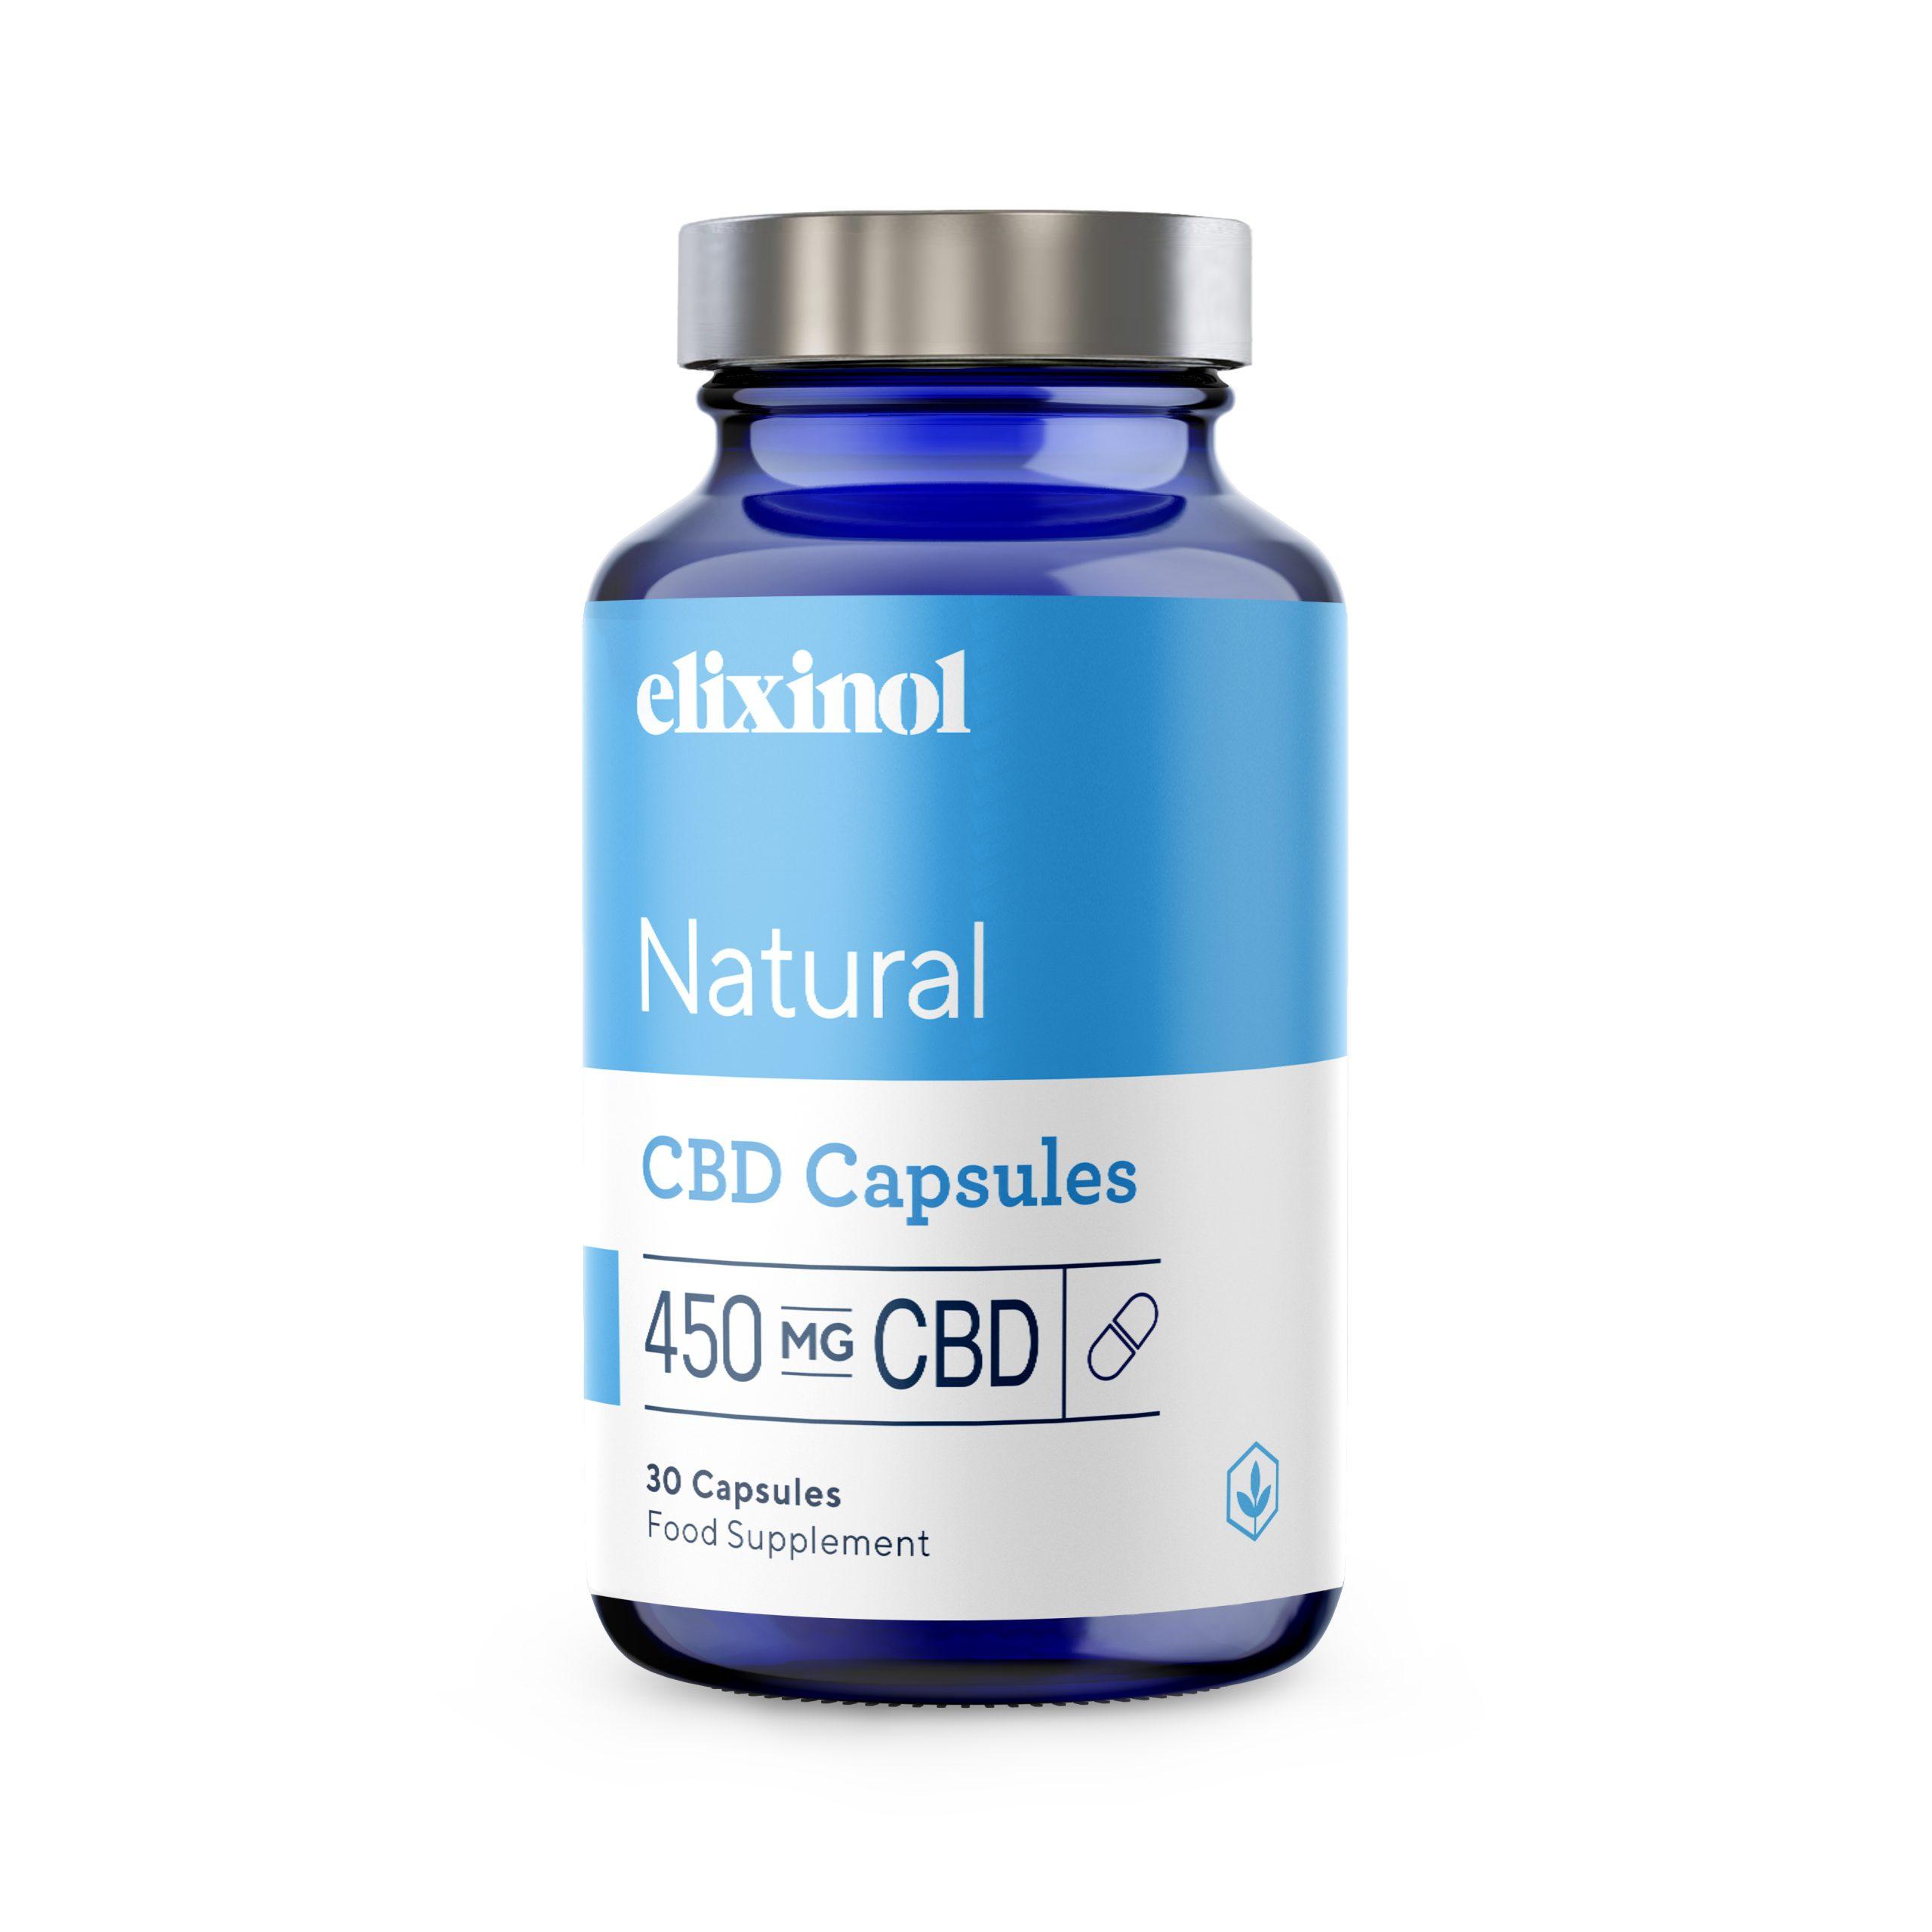 CBD Hemp Oil Capsules 450 mg of CBD